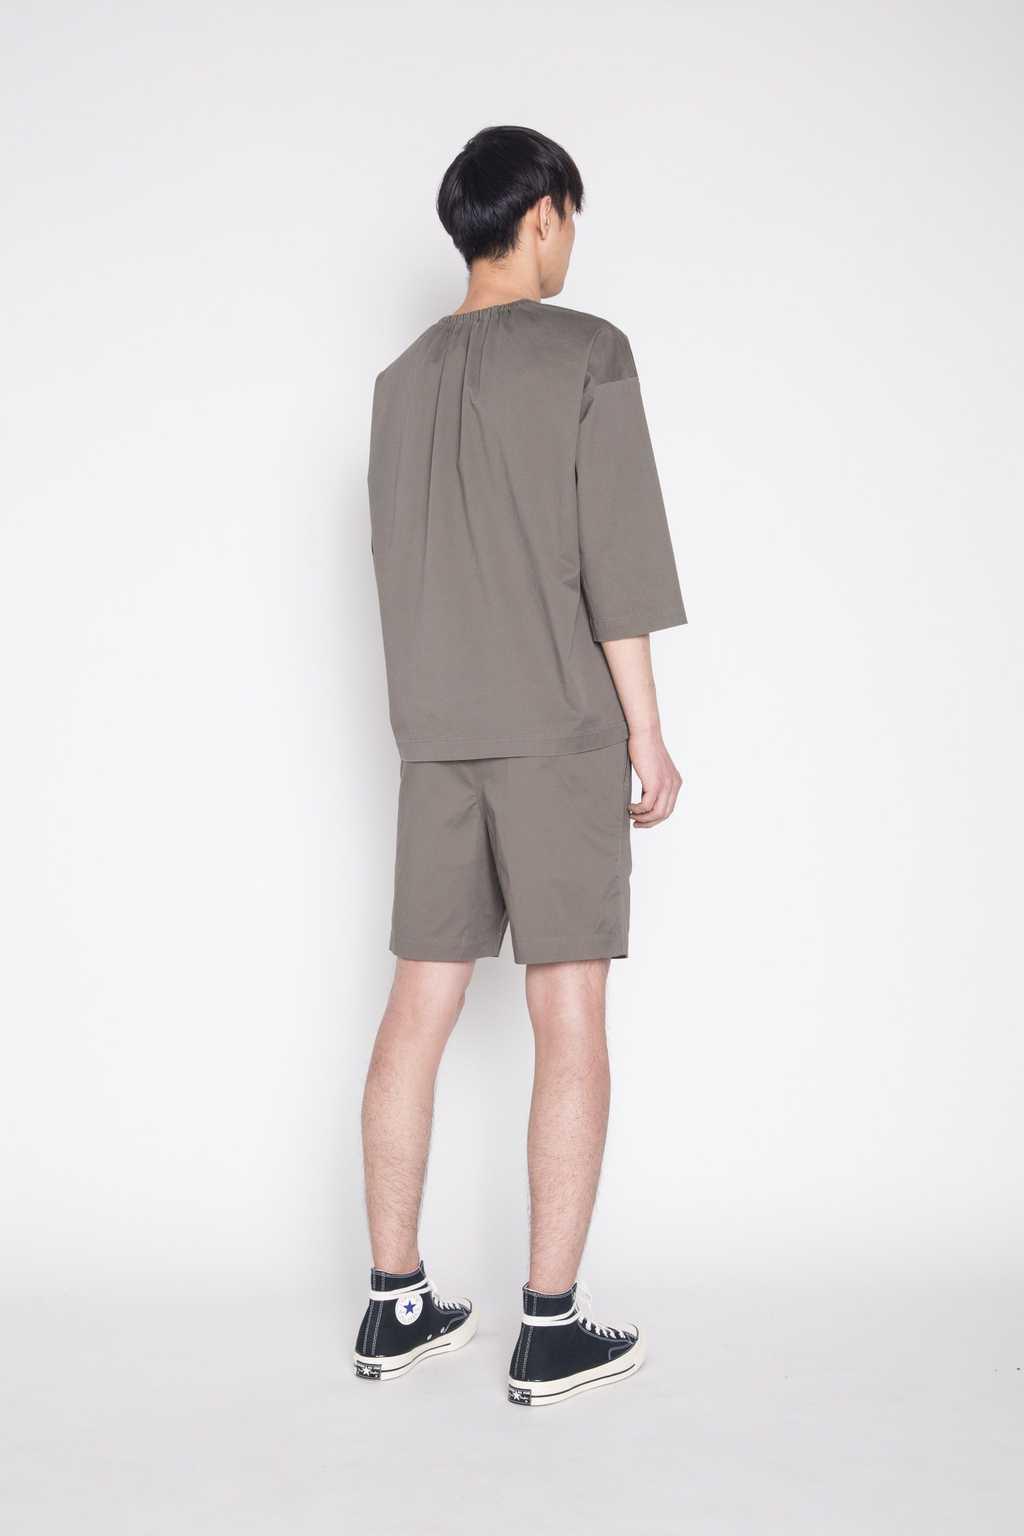 Shirt 1336 Olive 4